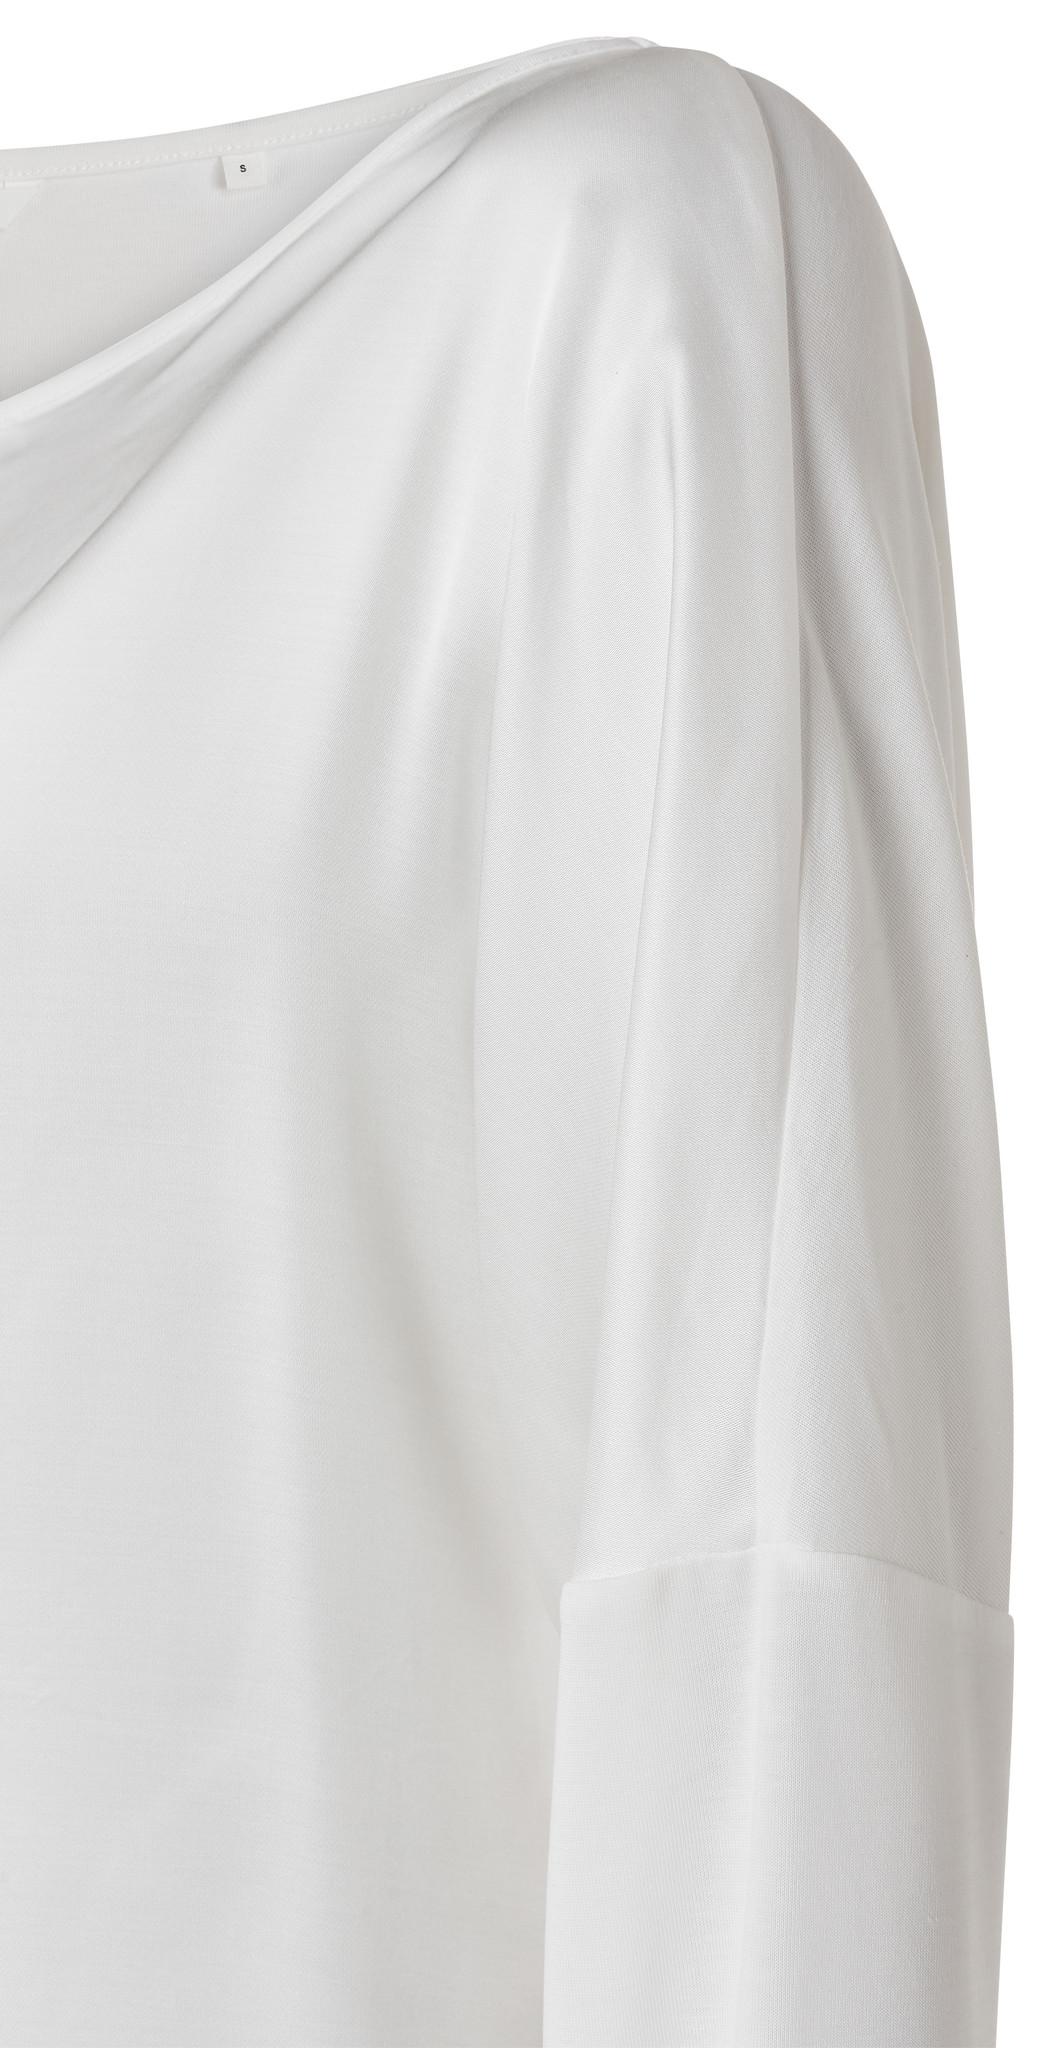 yaya Fabric mix top longs 1901397-112-2